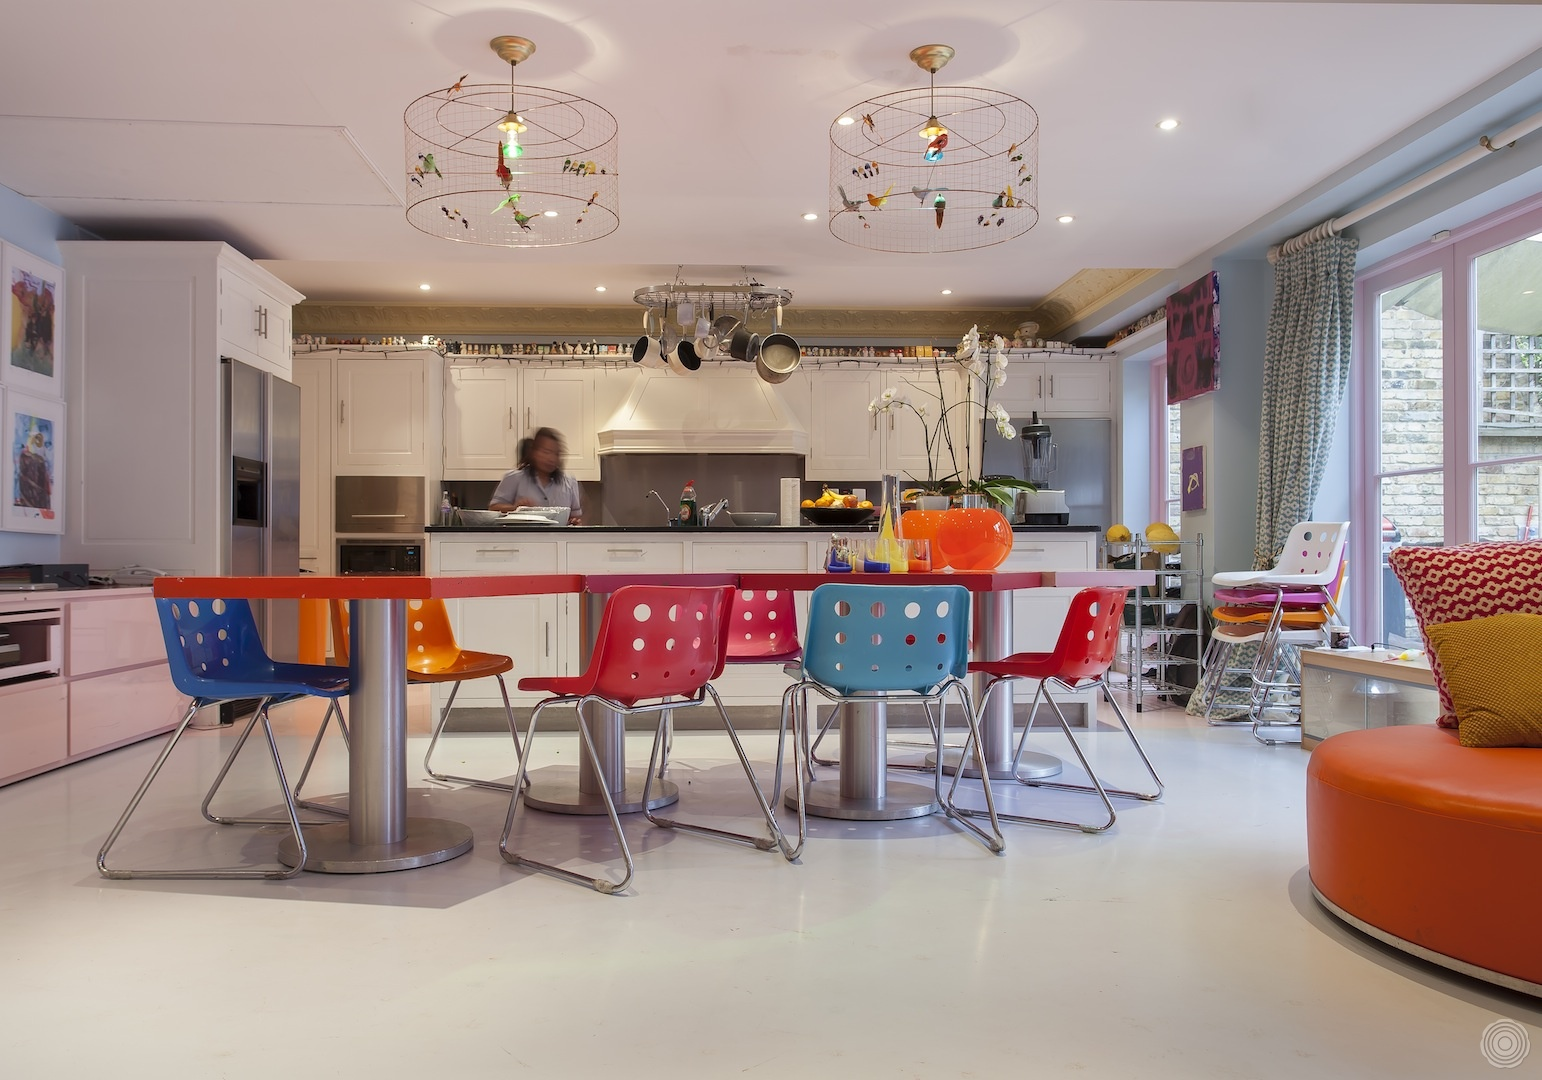 Gietvloeren Keuken : gietvloeren keuken